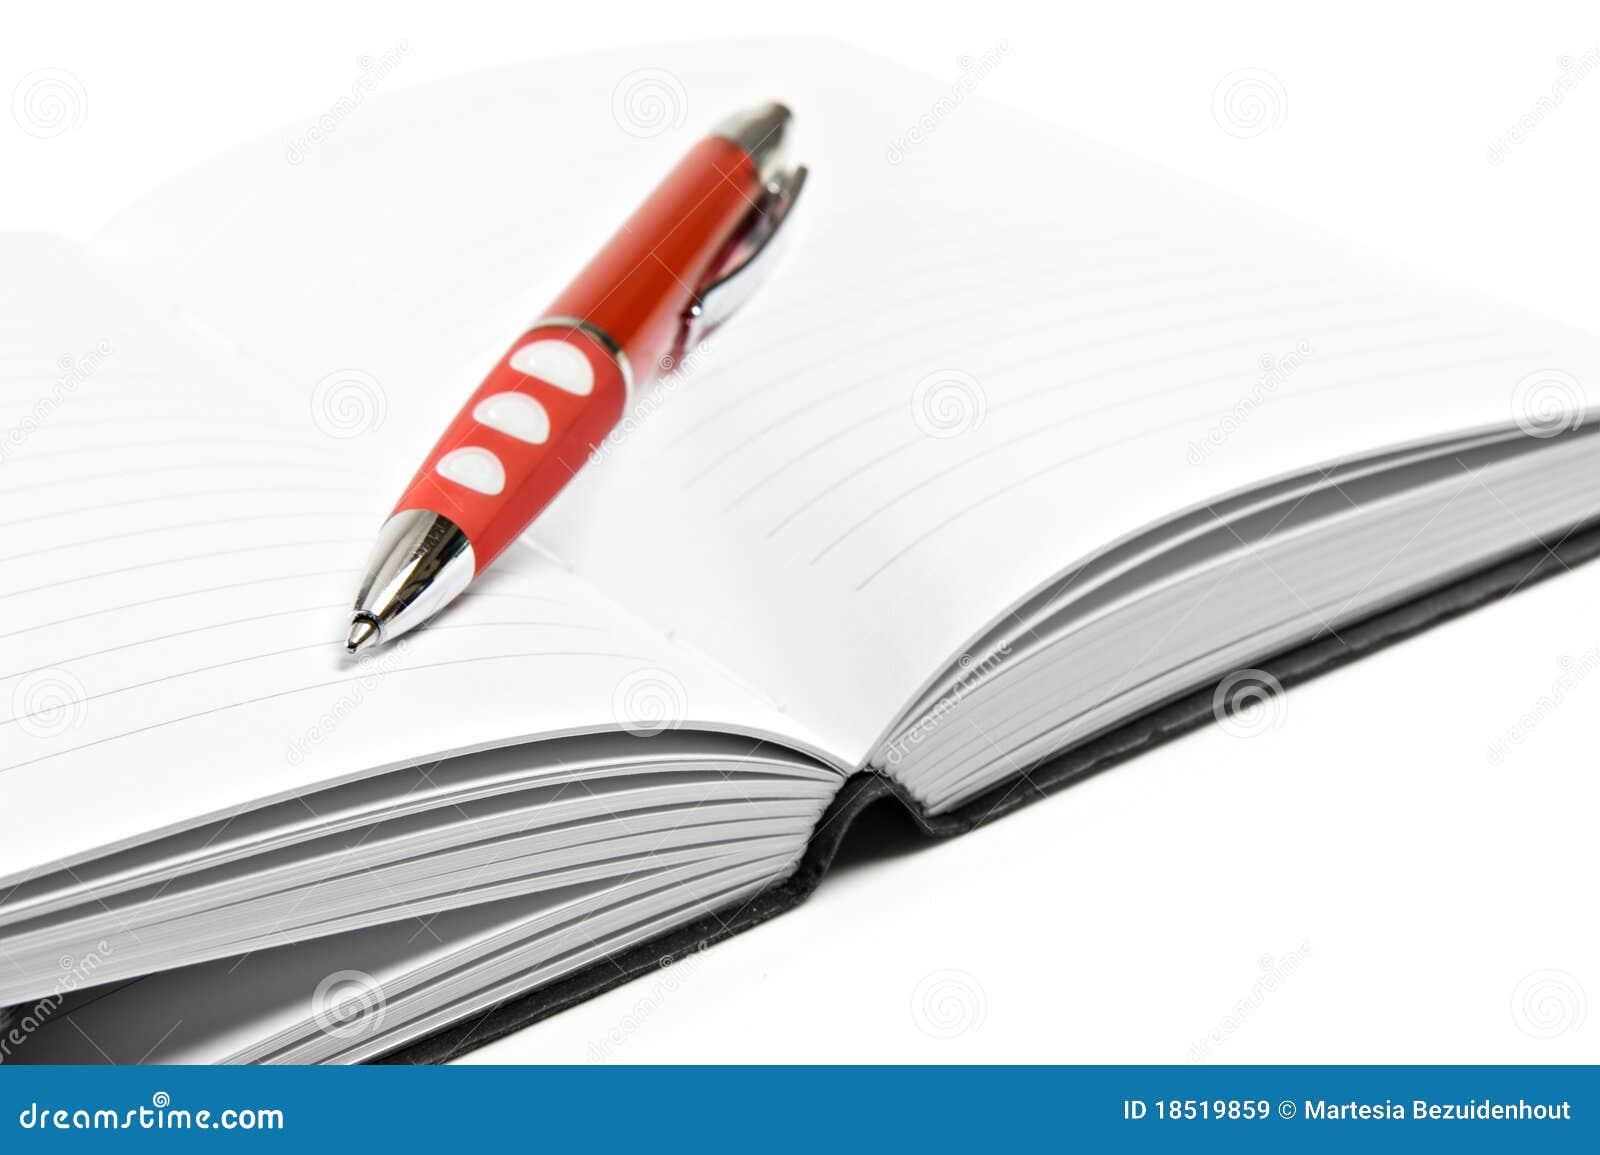 Diario con la pluma roja